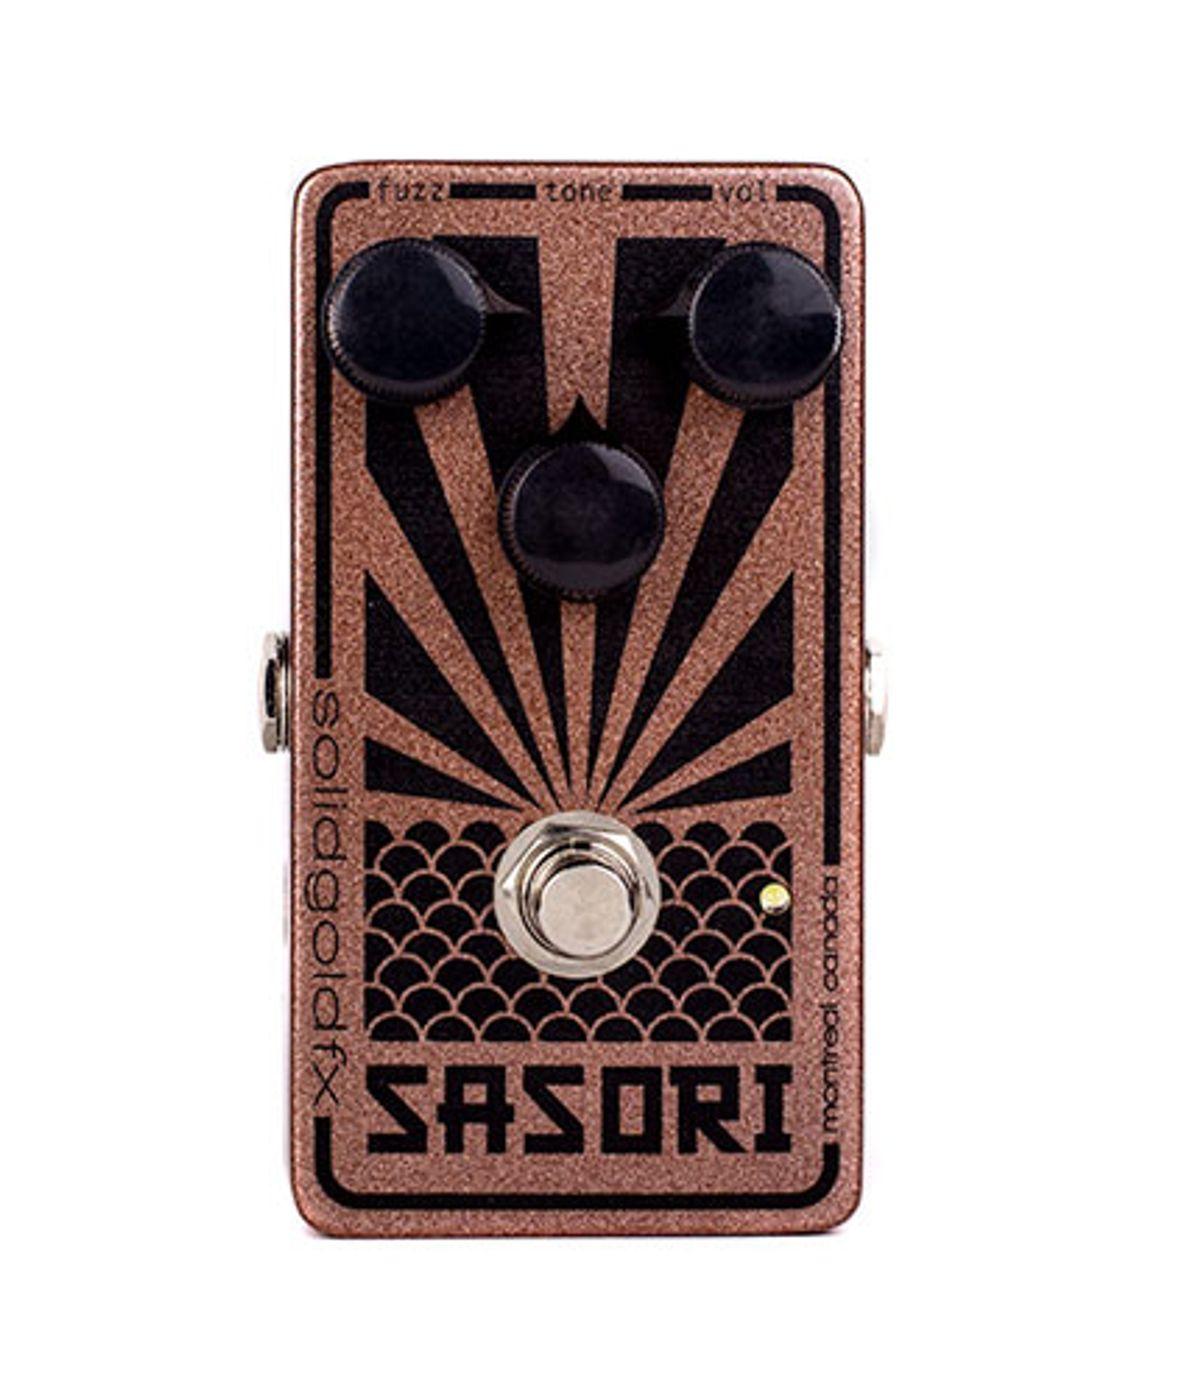 SolidGoldFX Releases the Sasori Fuzz